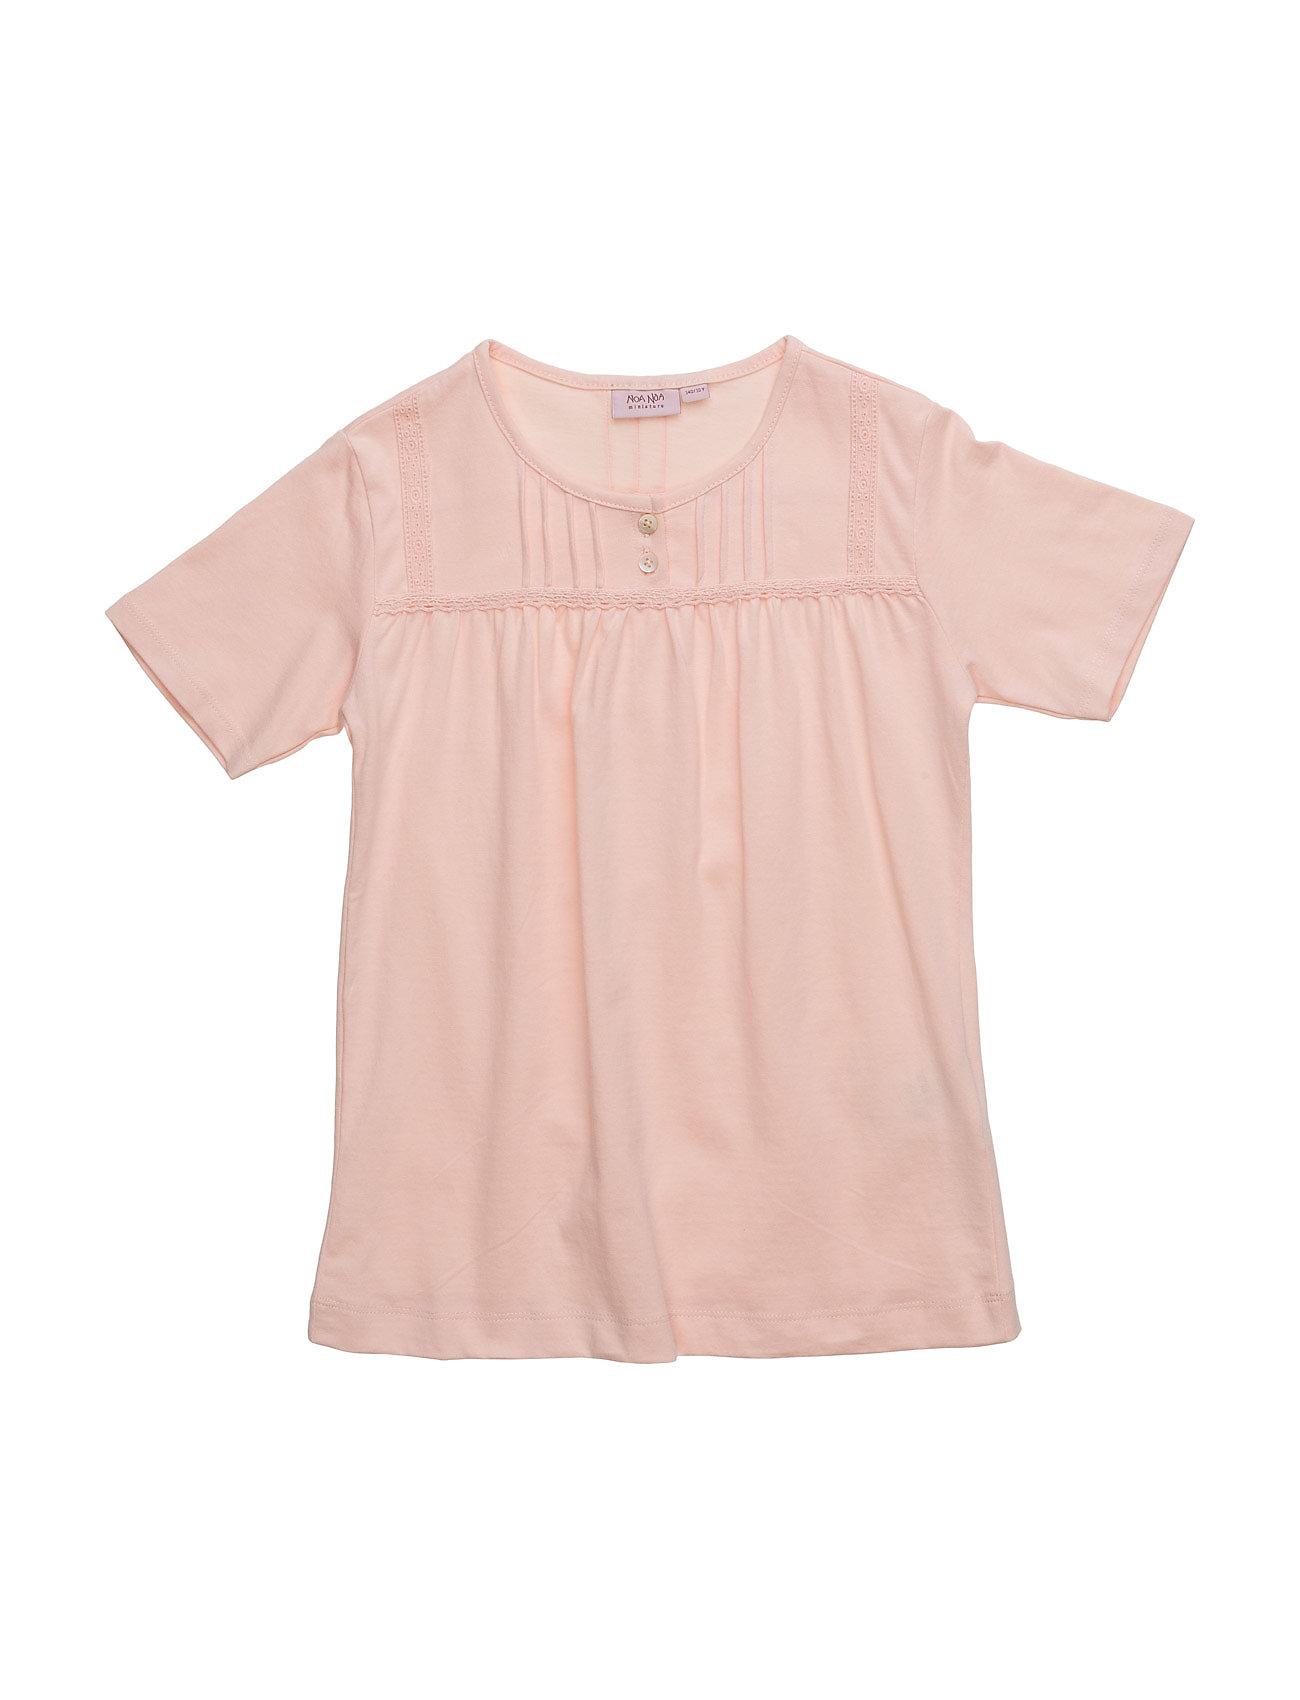 T-Shirt Noa Noa Miniature Kortærmede t-shirts til Børn i